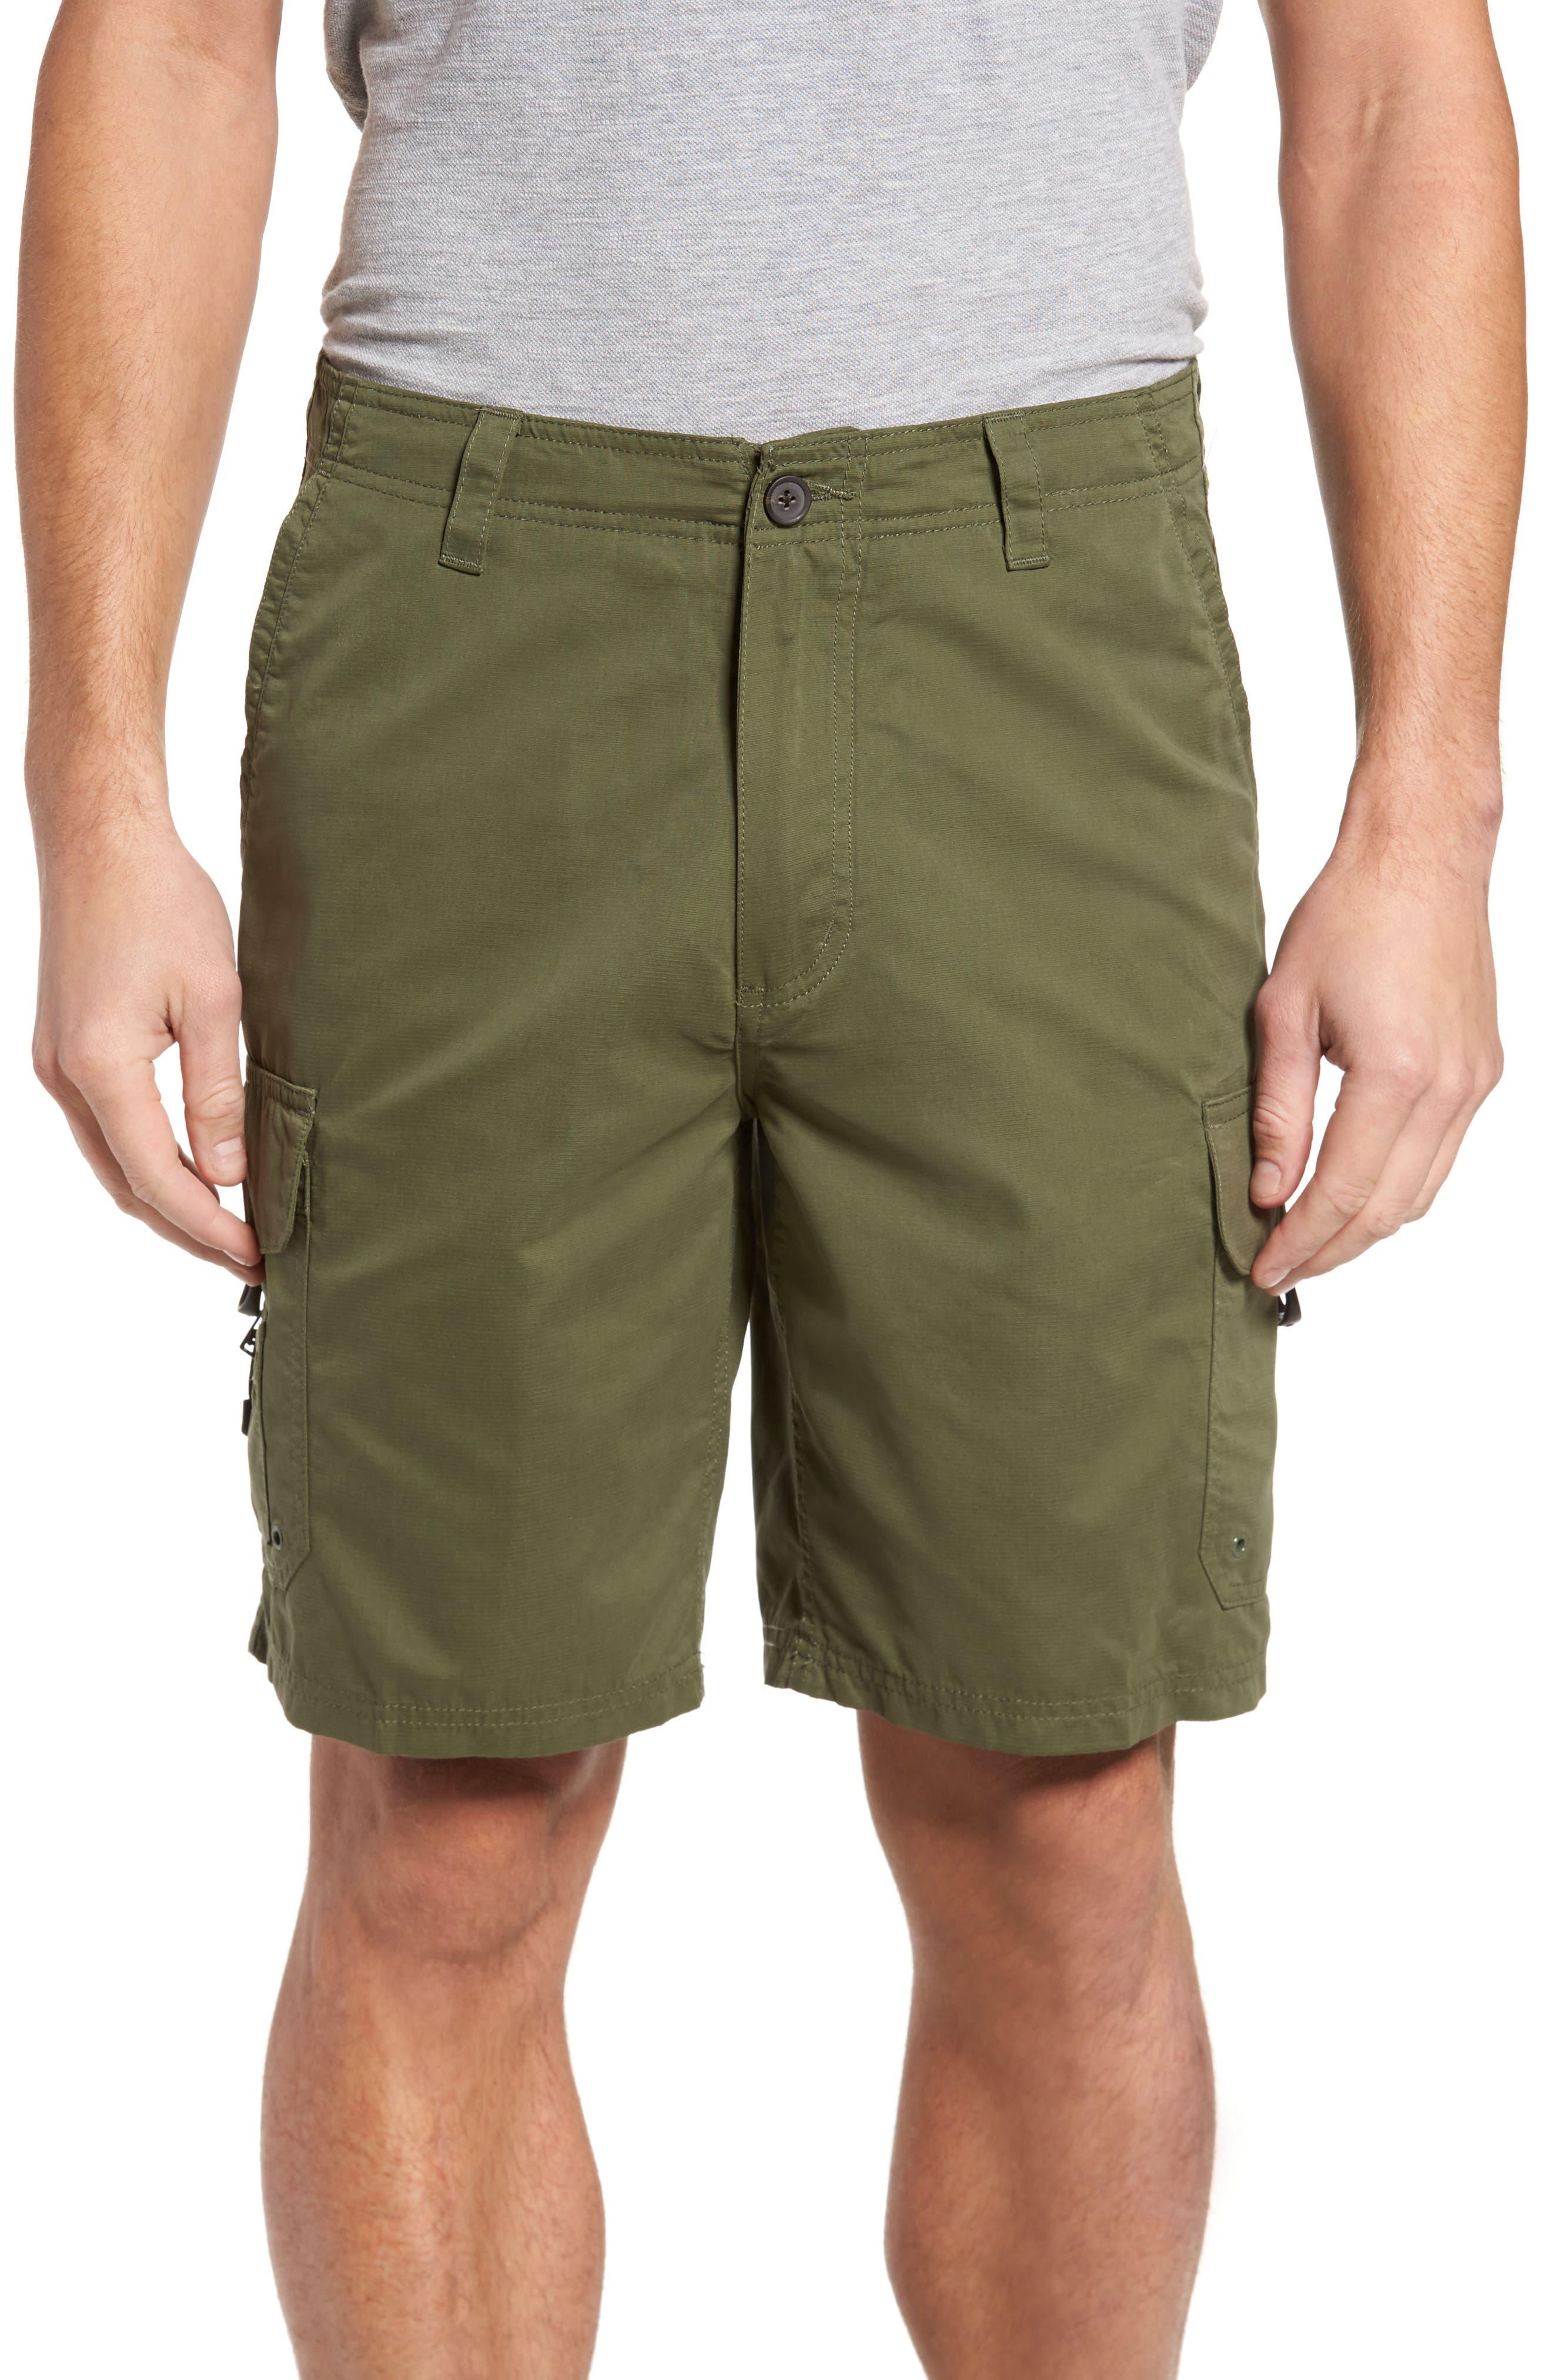 Maldive Cargo Shorts,                         Main,                         color, 304